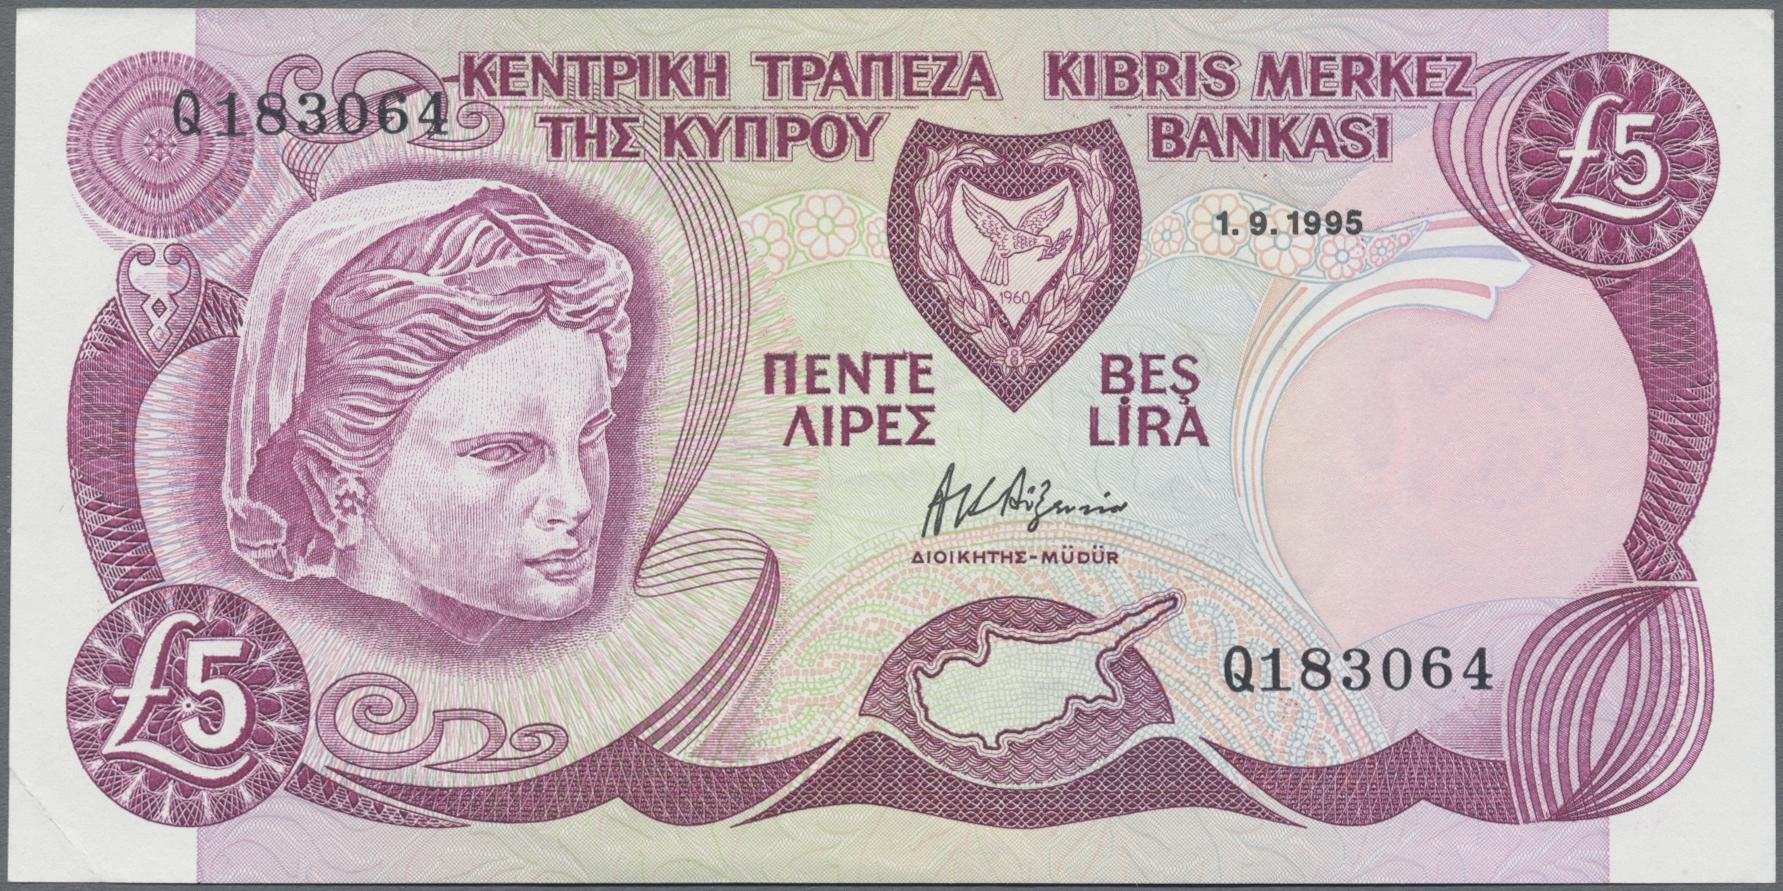 Lot 00162 - Cyprus / Zypern | Banknoten  -  Auktionshaus Christoph Gärtner GmbH & Co. KG Sale #48 The Banknotes